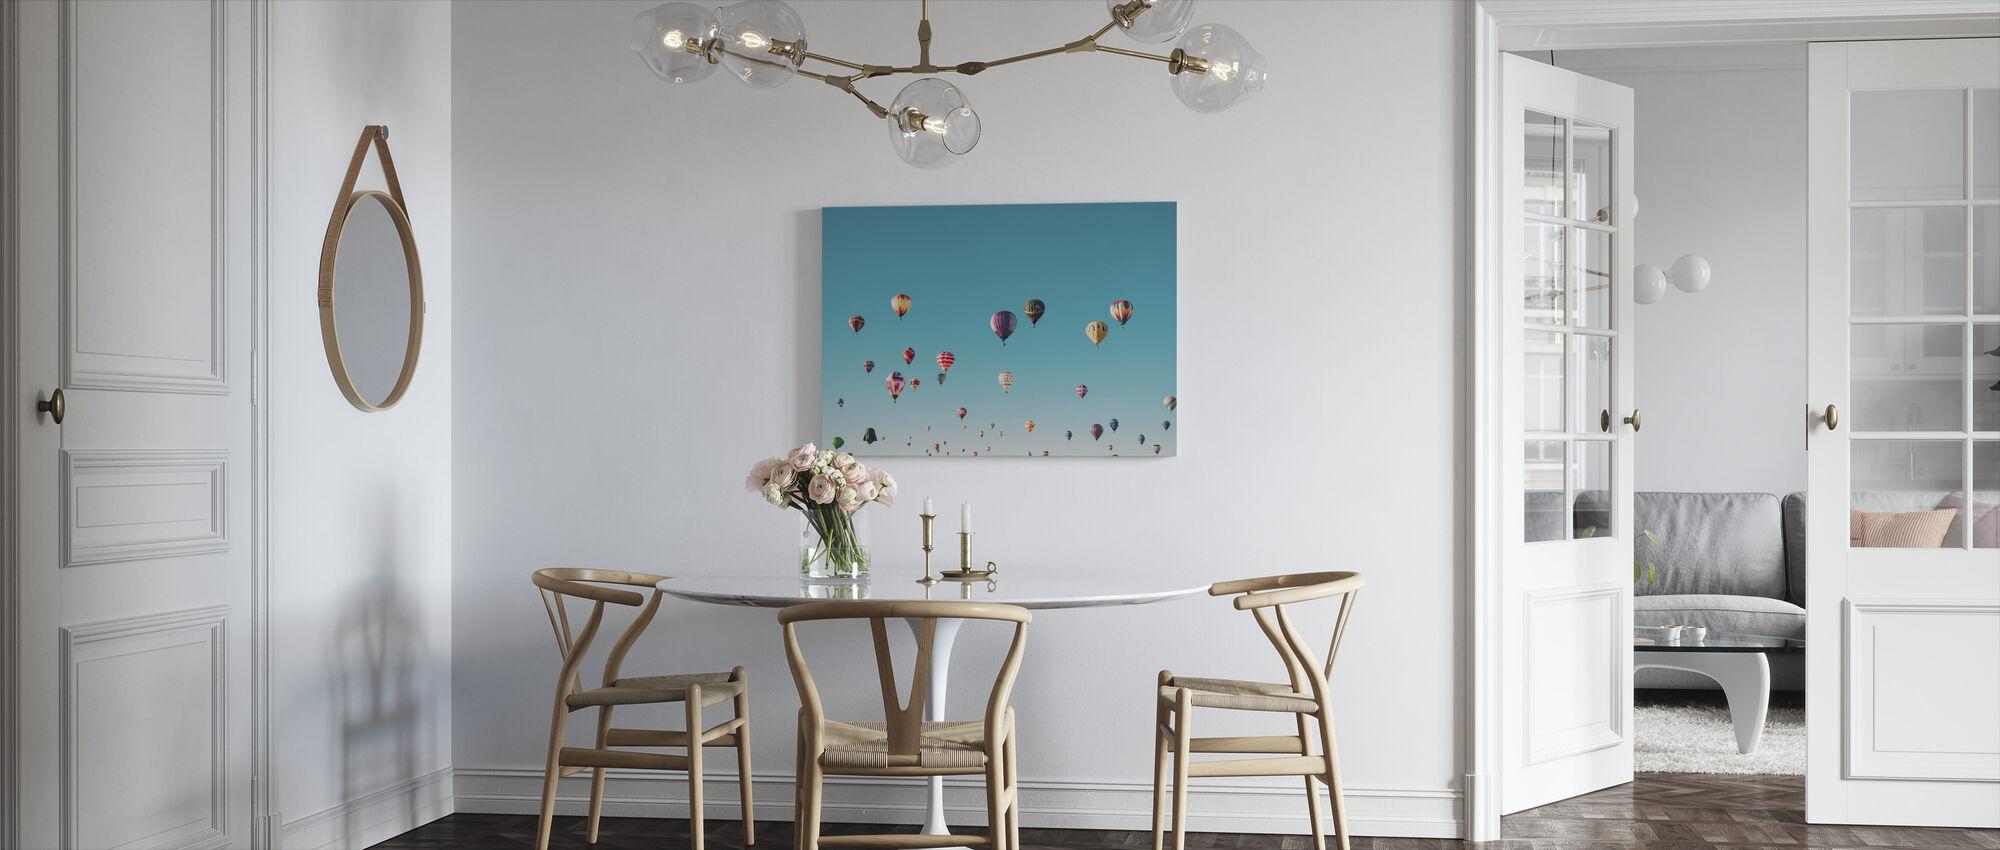 Hot Air Balloons - Canvas print - Kitchen